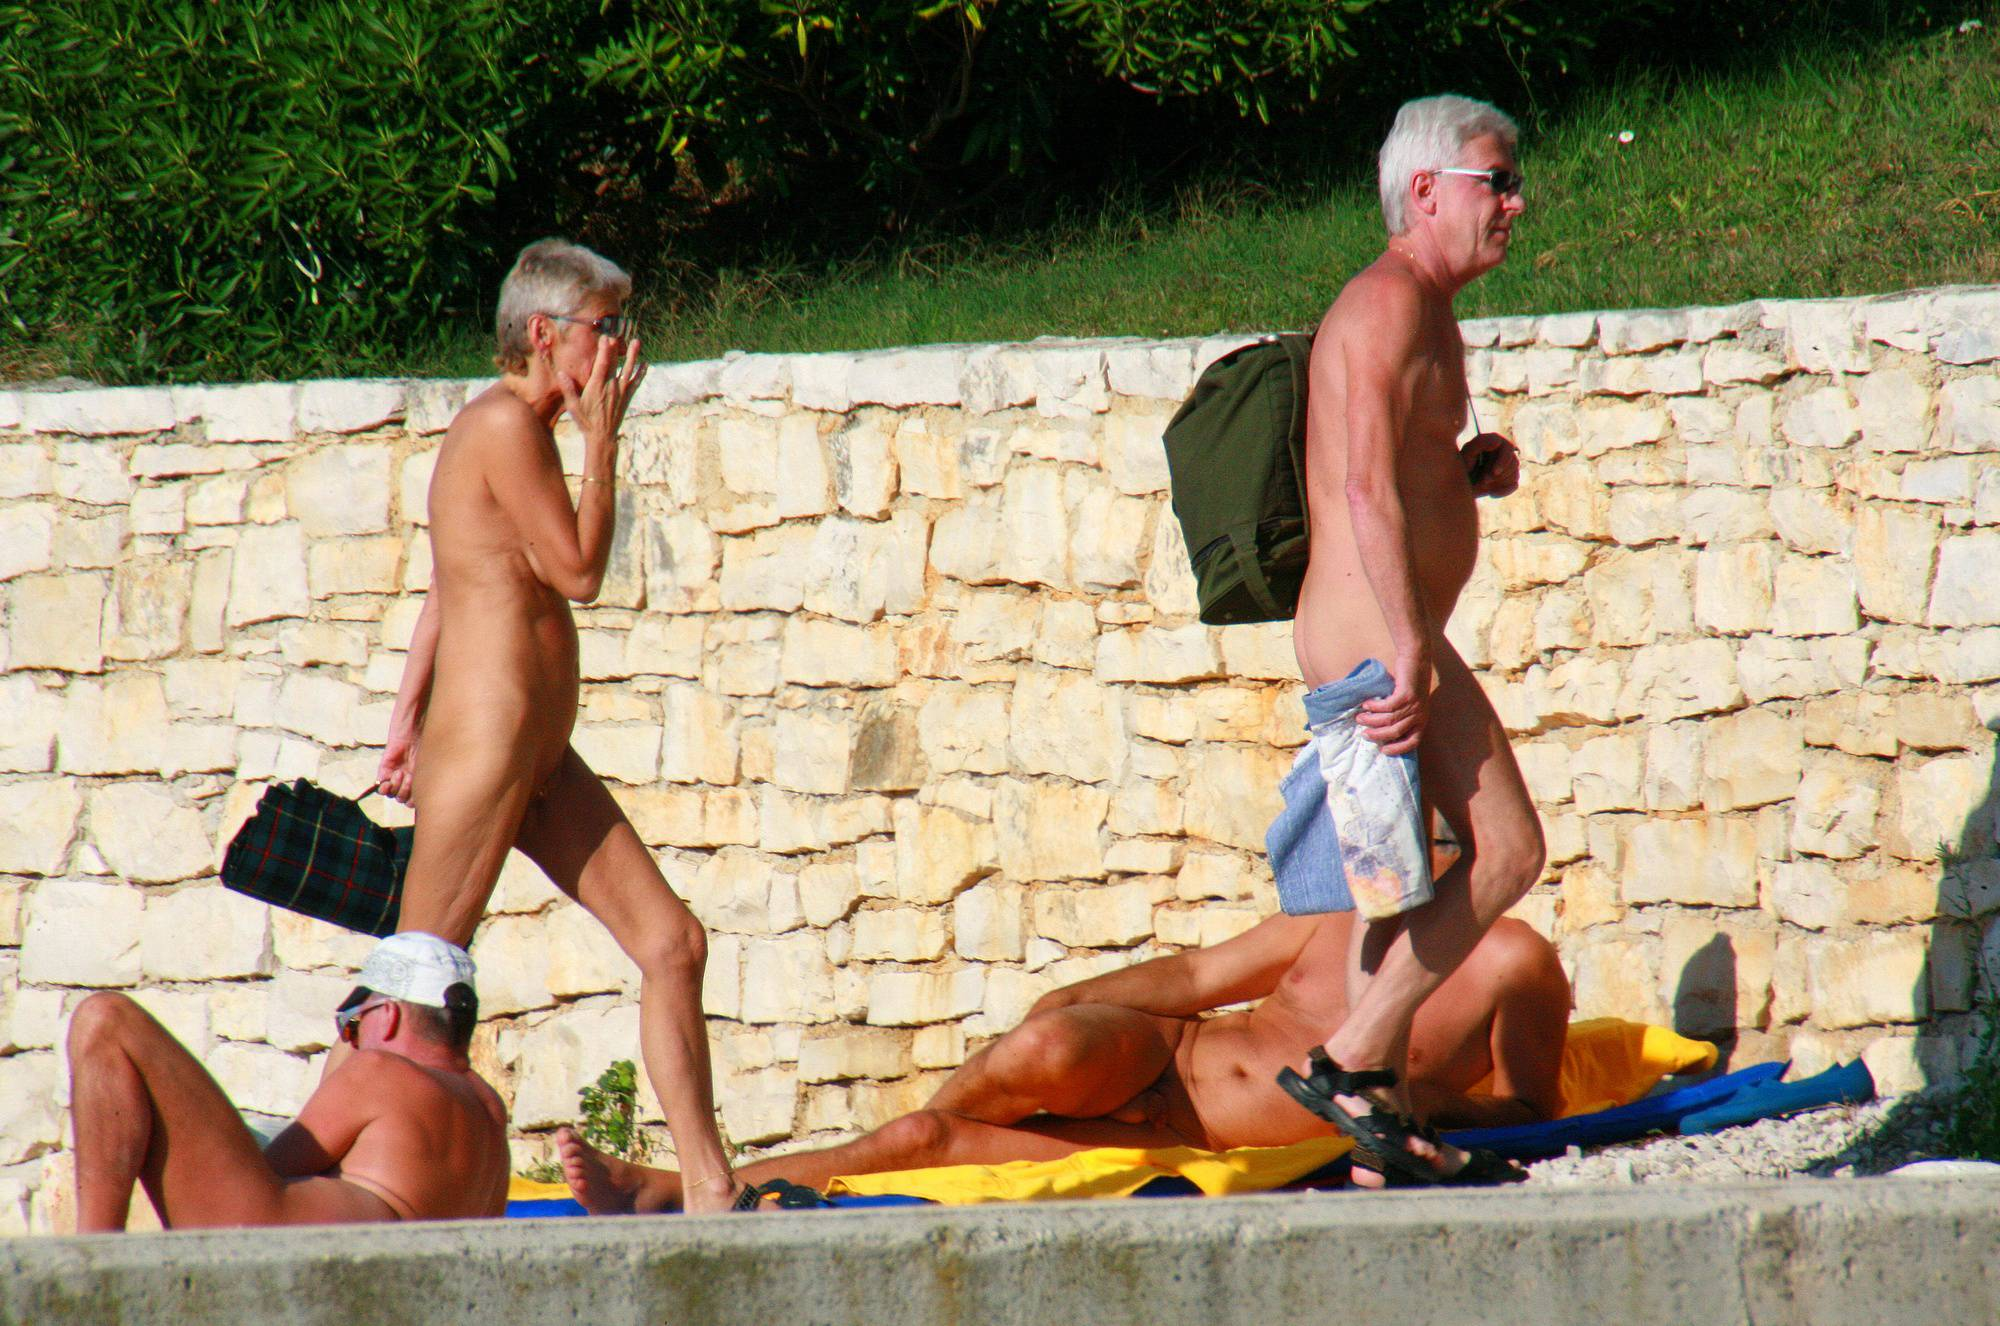 Nudist Photos Ula FKK Wall-Side Passby - 1